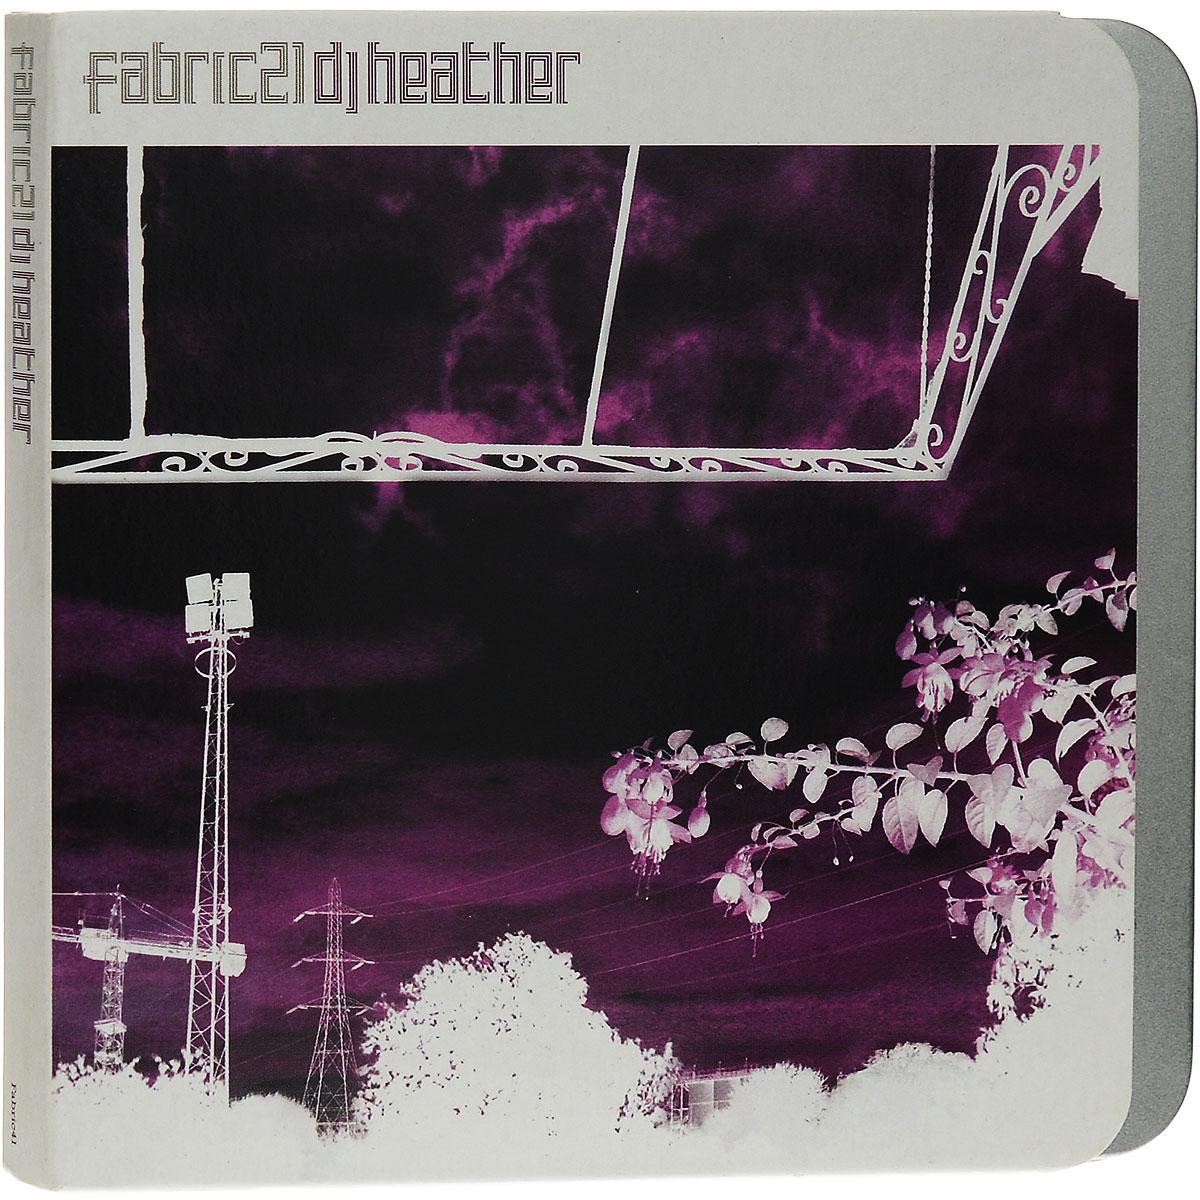 DJ Heather. Fabric21 2005 Audio CD